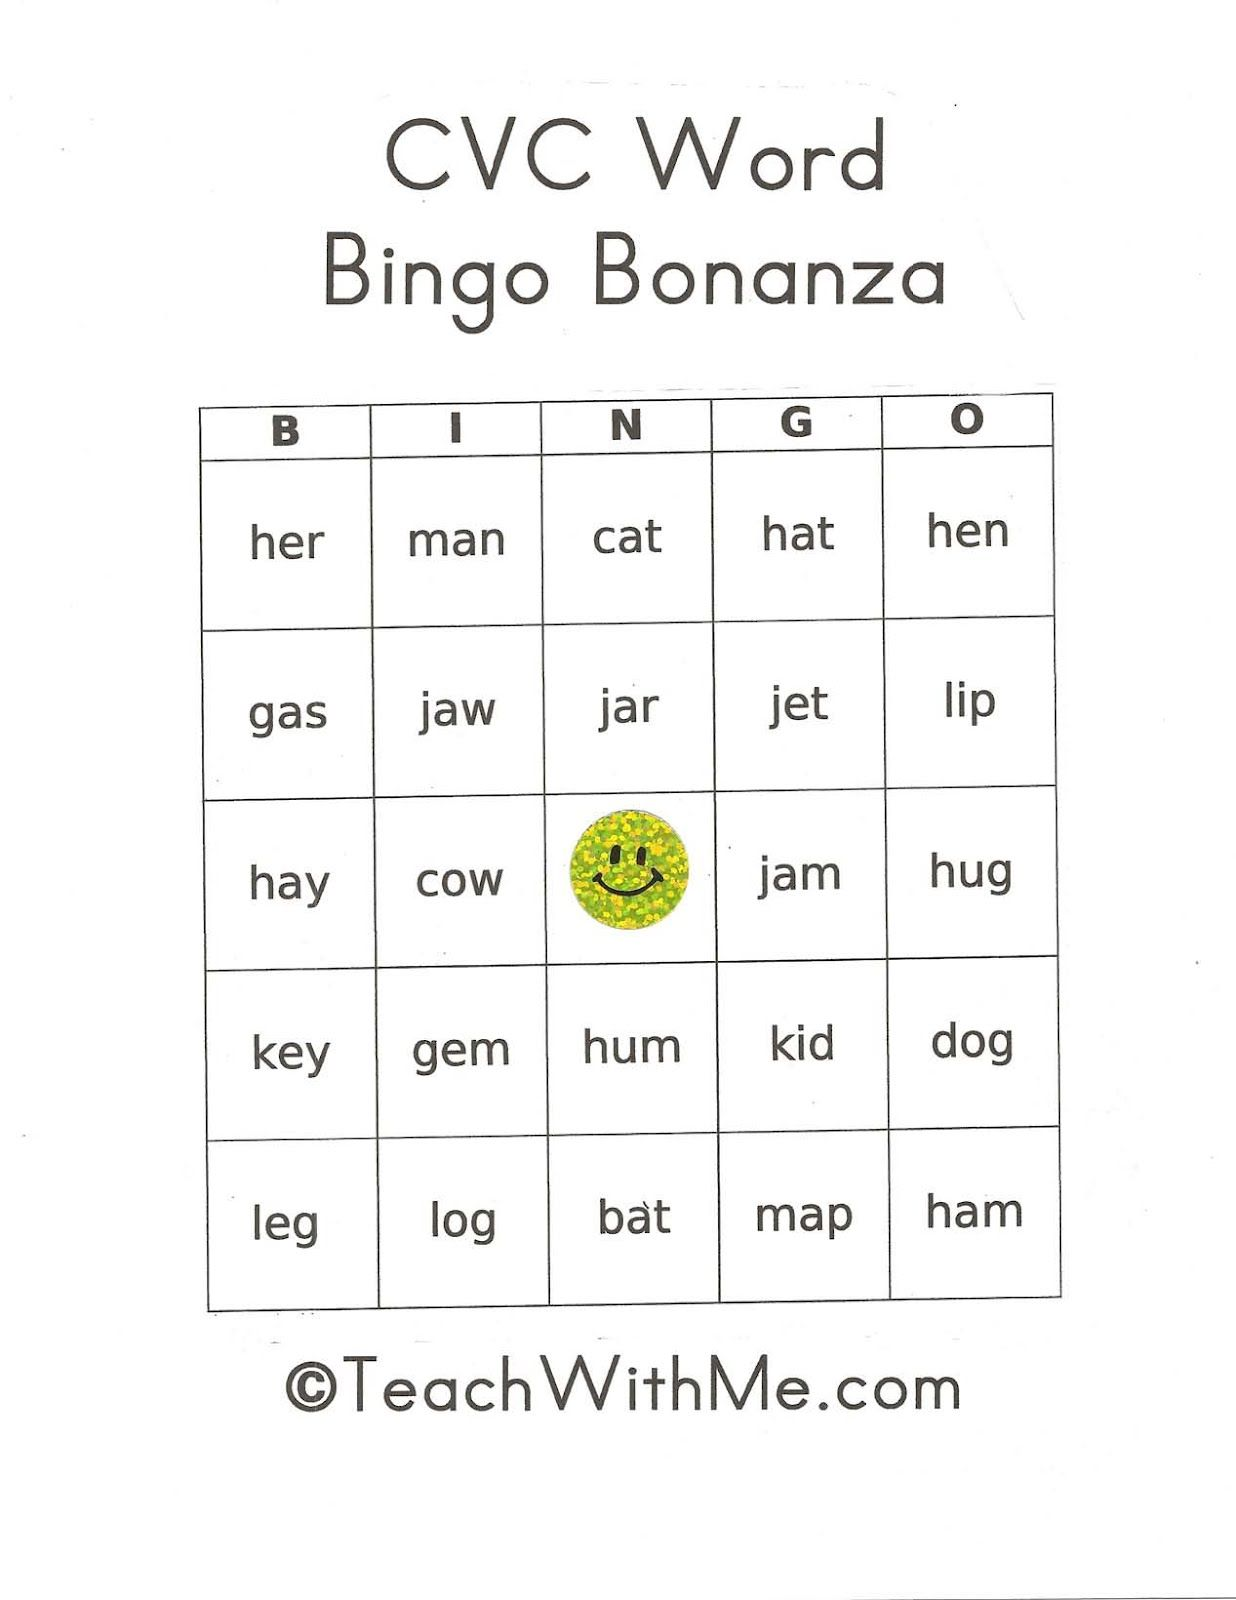 Pk 2 Cvc Words Bingo Game